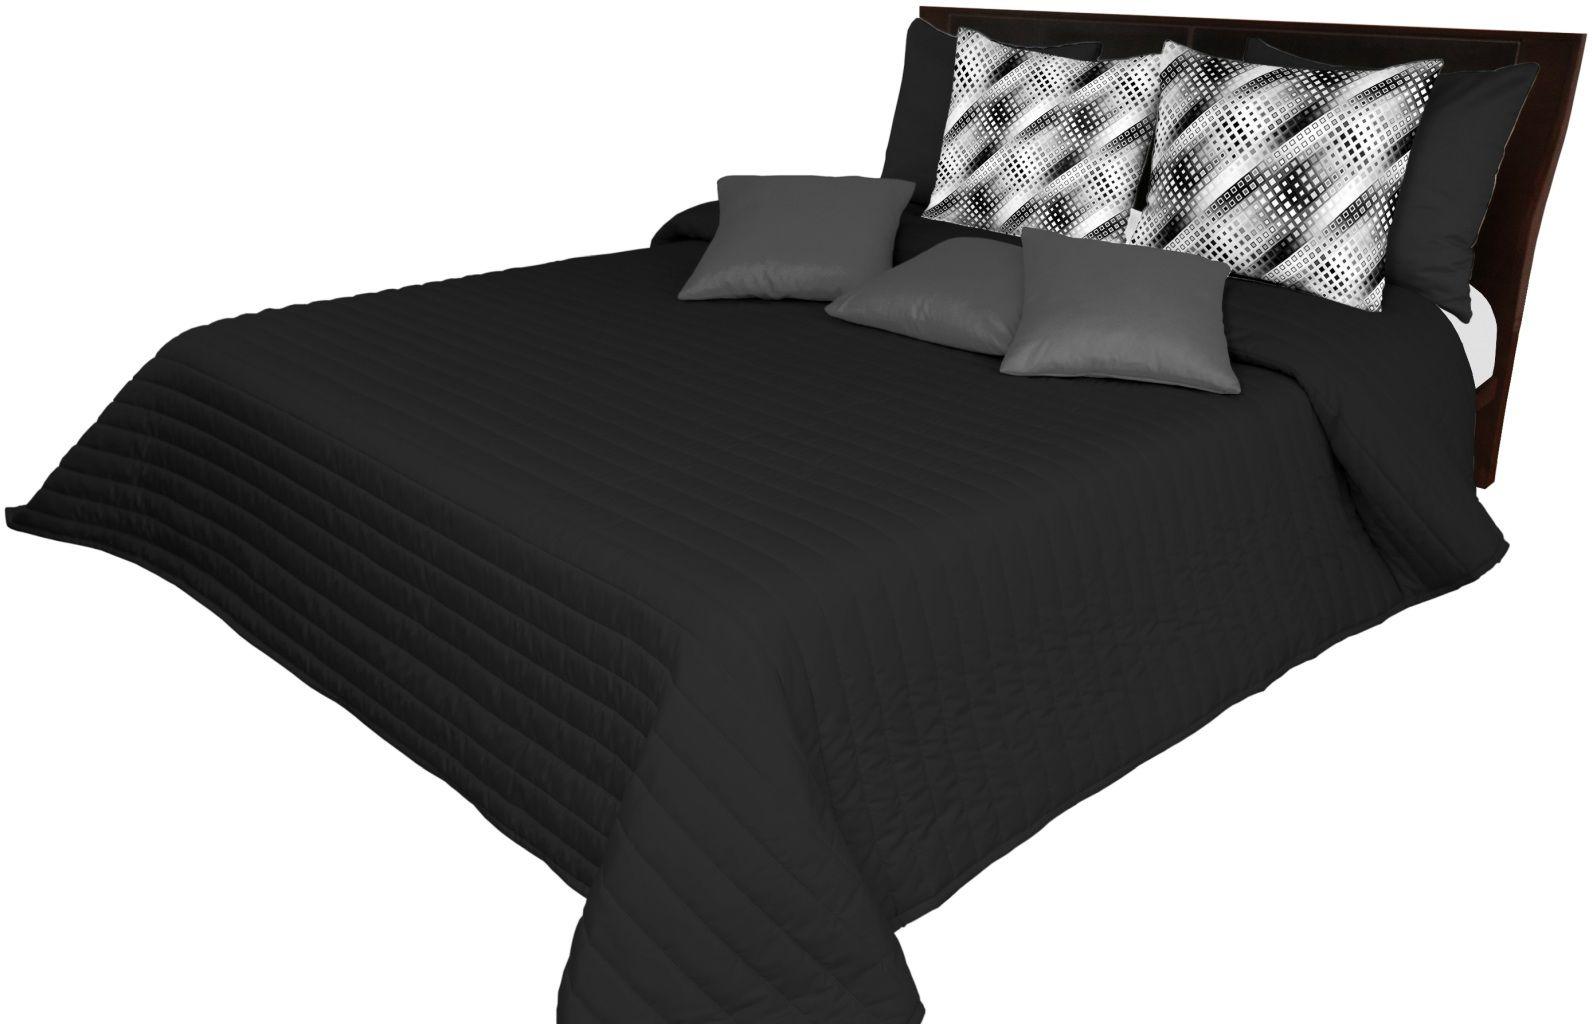 Narzuta pikowana na łóżko NMG-03 Mariall